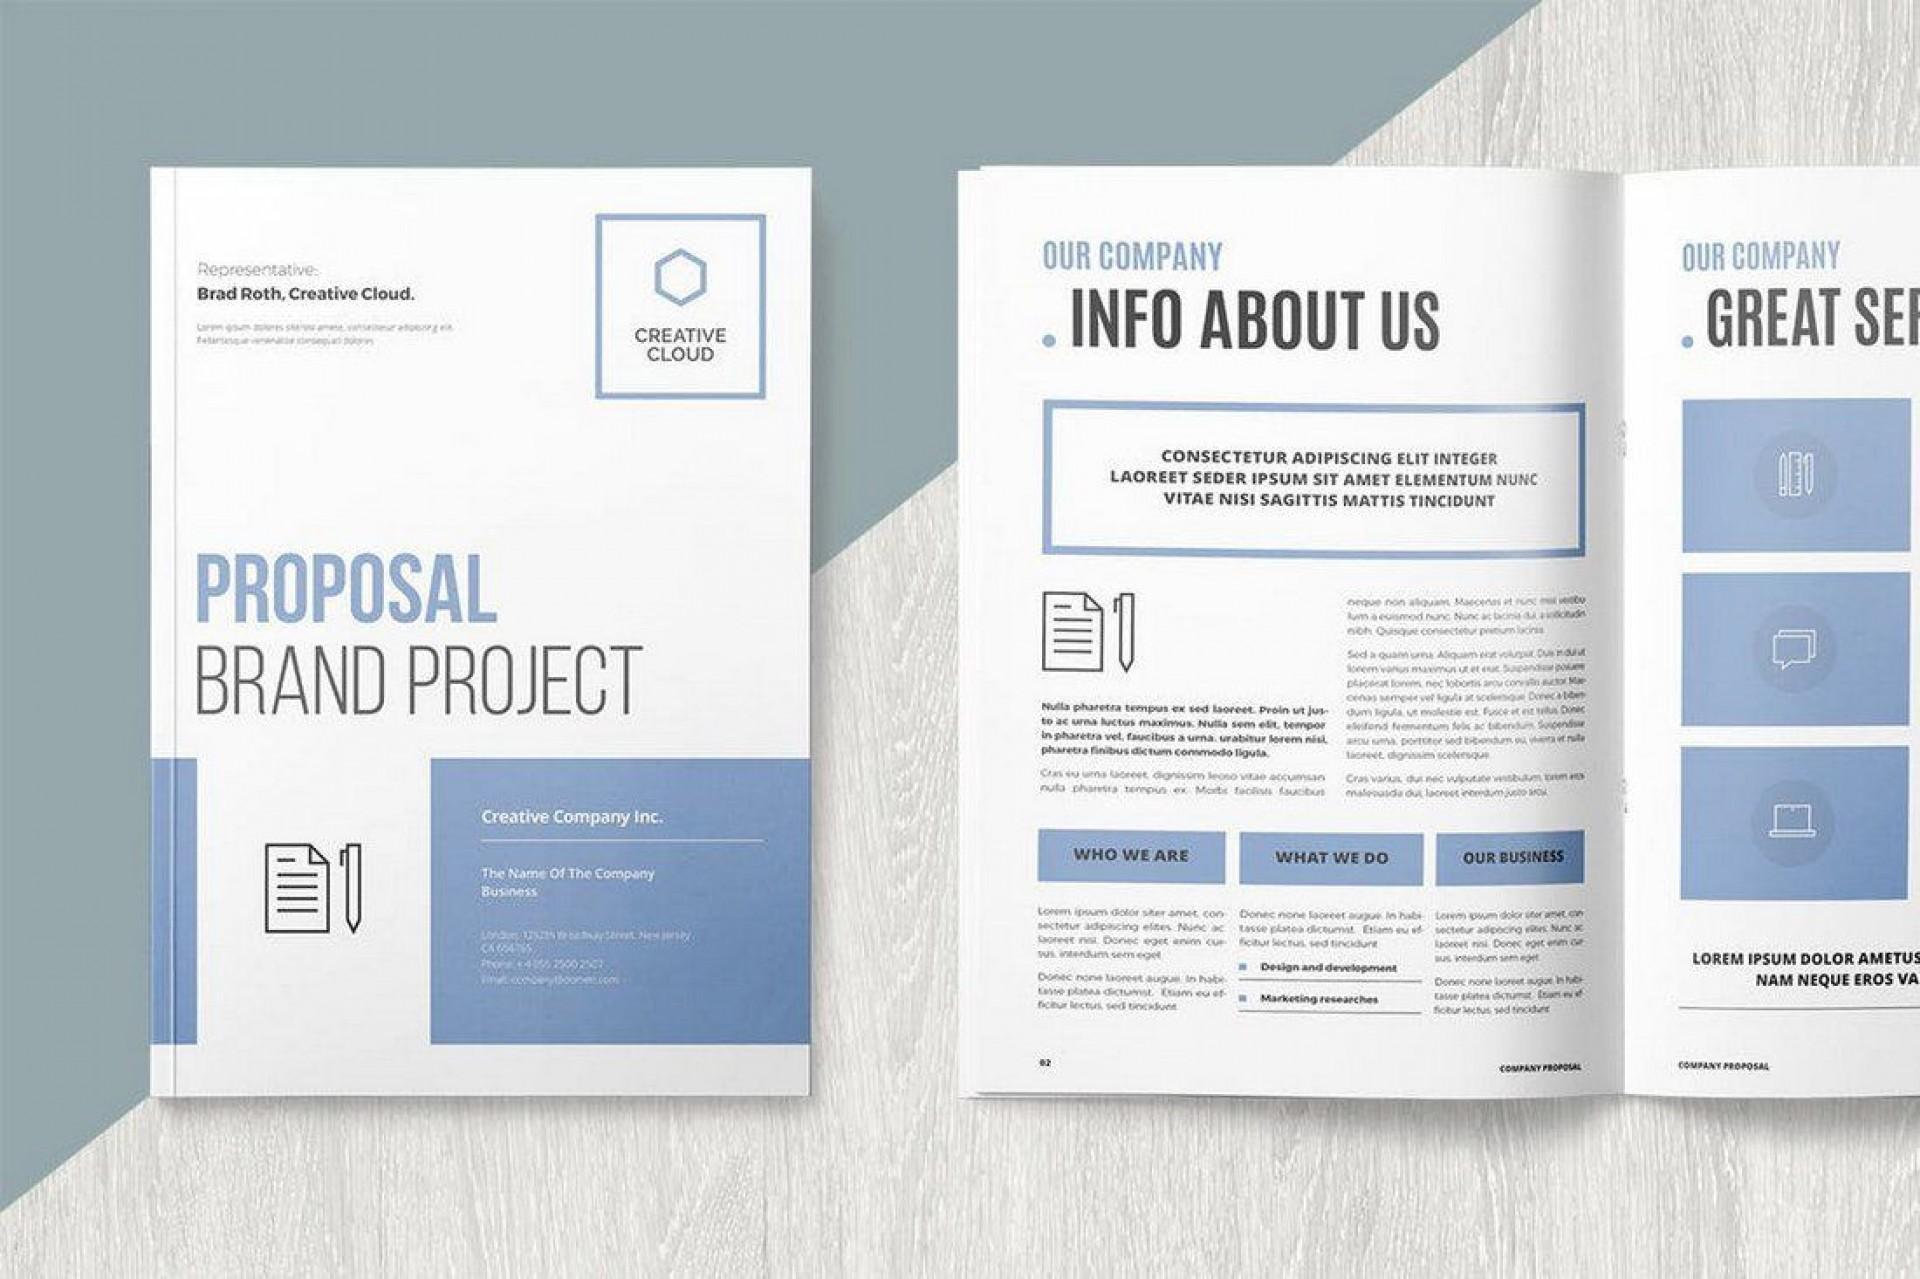 004 Best Microsoft Word Brochure Format High Definition  2007 Flyer Template 3 Fold1920